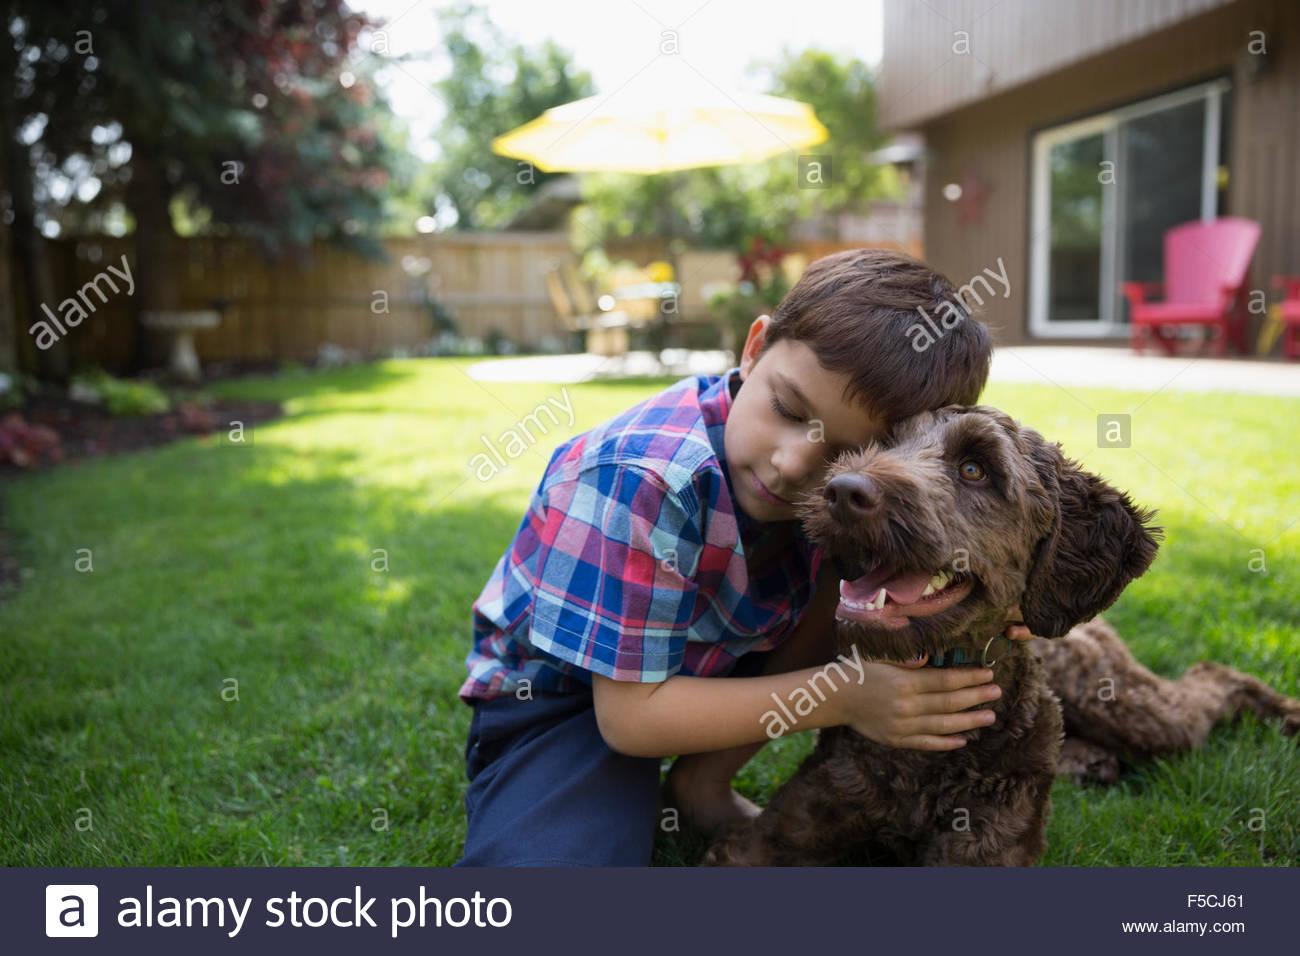 Affectionate boy hugging dog on lawn - Stock Image